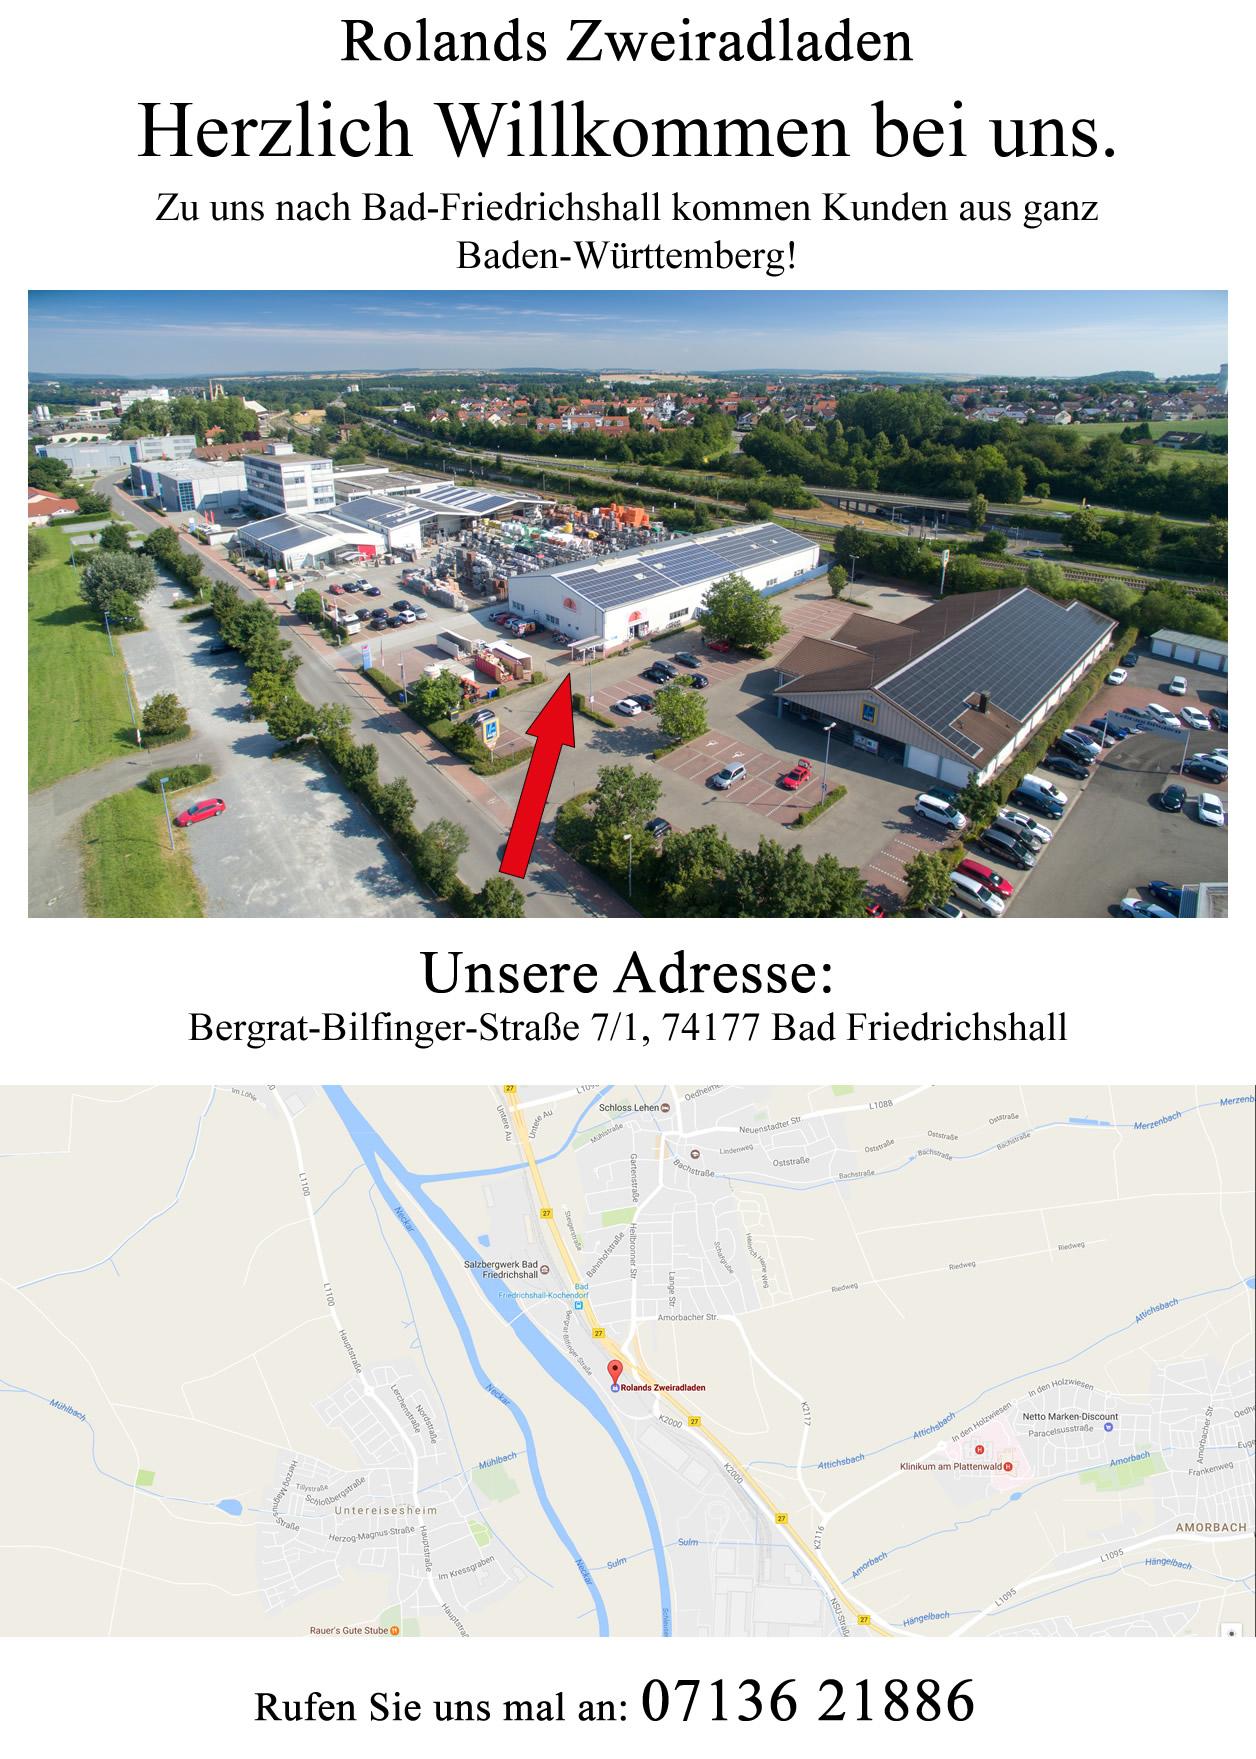 Fahrrad Laden in 74220 Flein, Talheim, Nordheim, Lauffen am Neckar, Untergruppenbach, Heilbronn, Kirchheim am Neckar oder Neckarwestheim, Ilsfeld, Abstatt